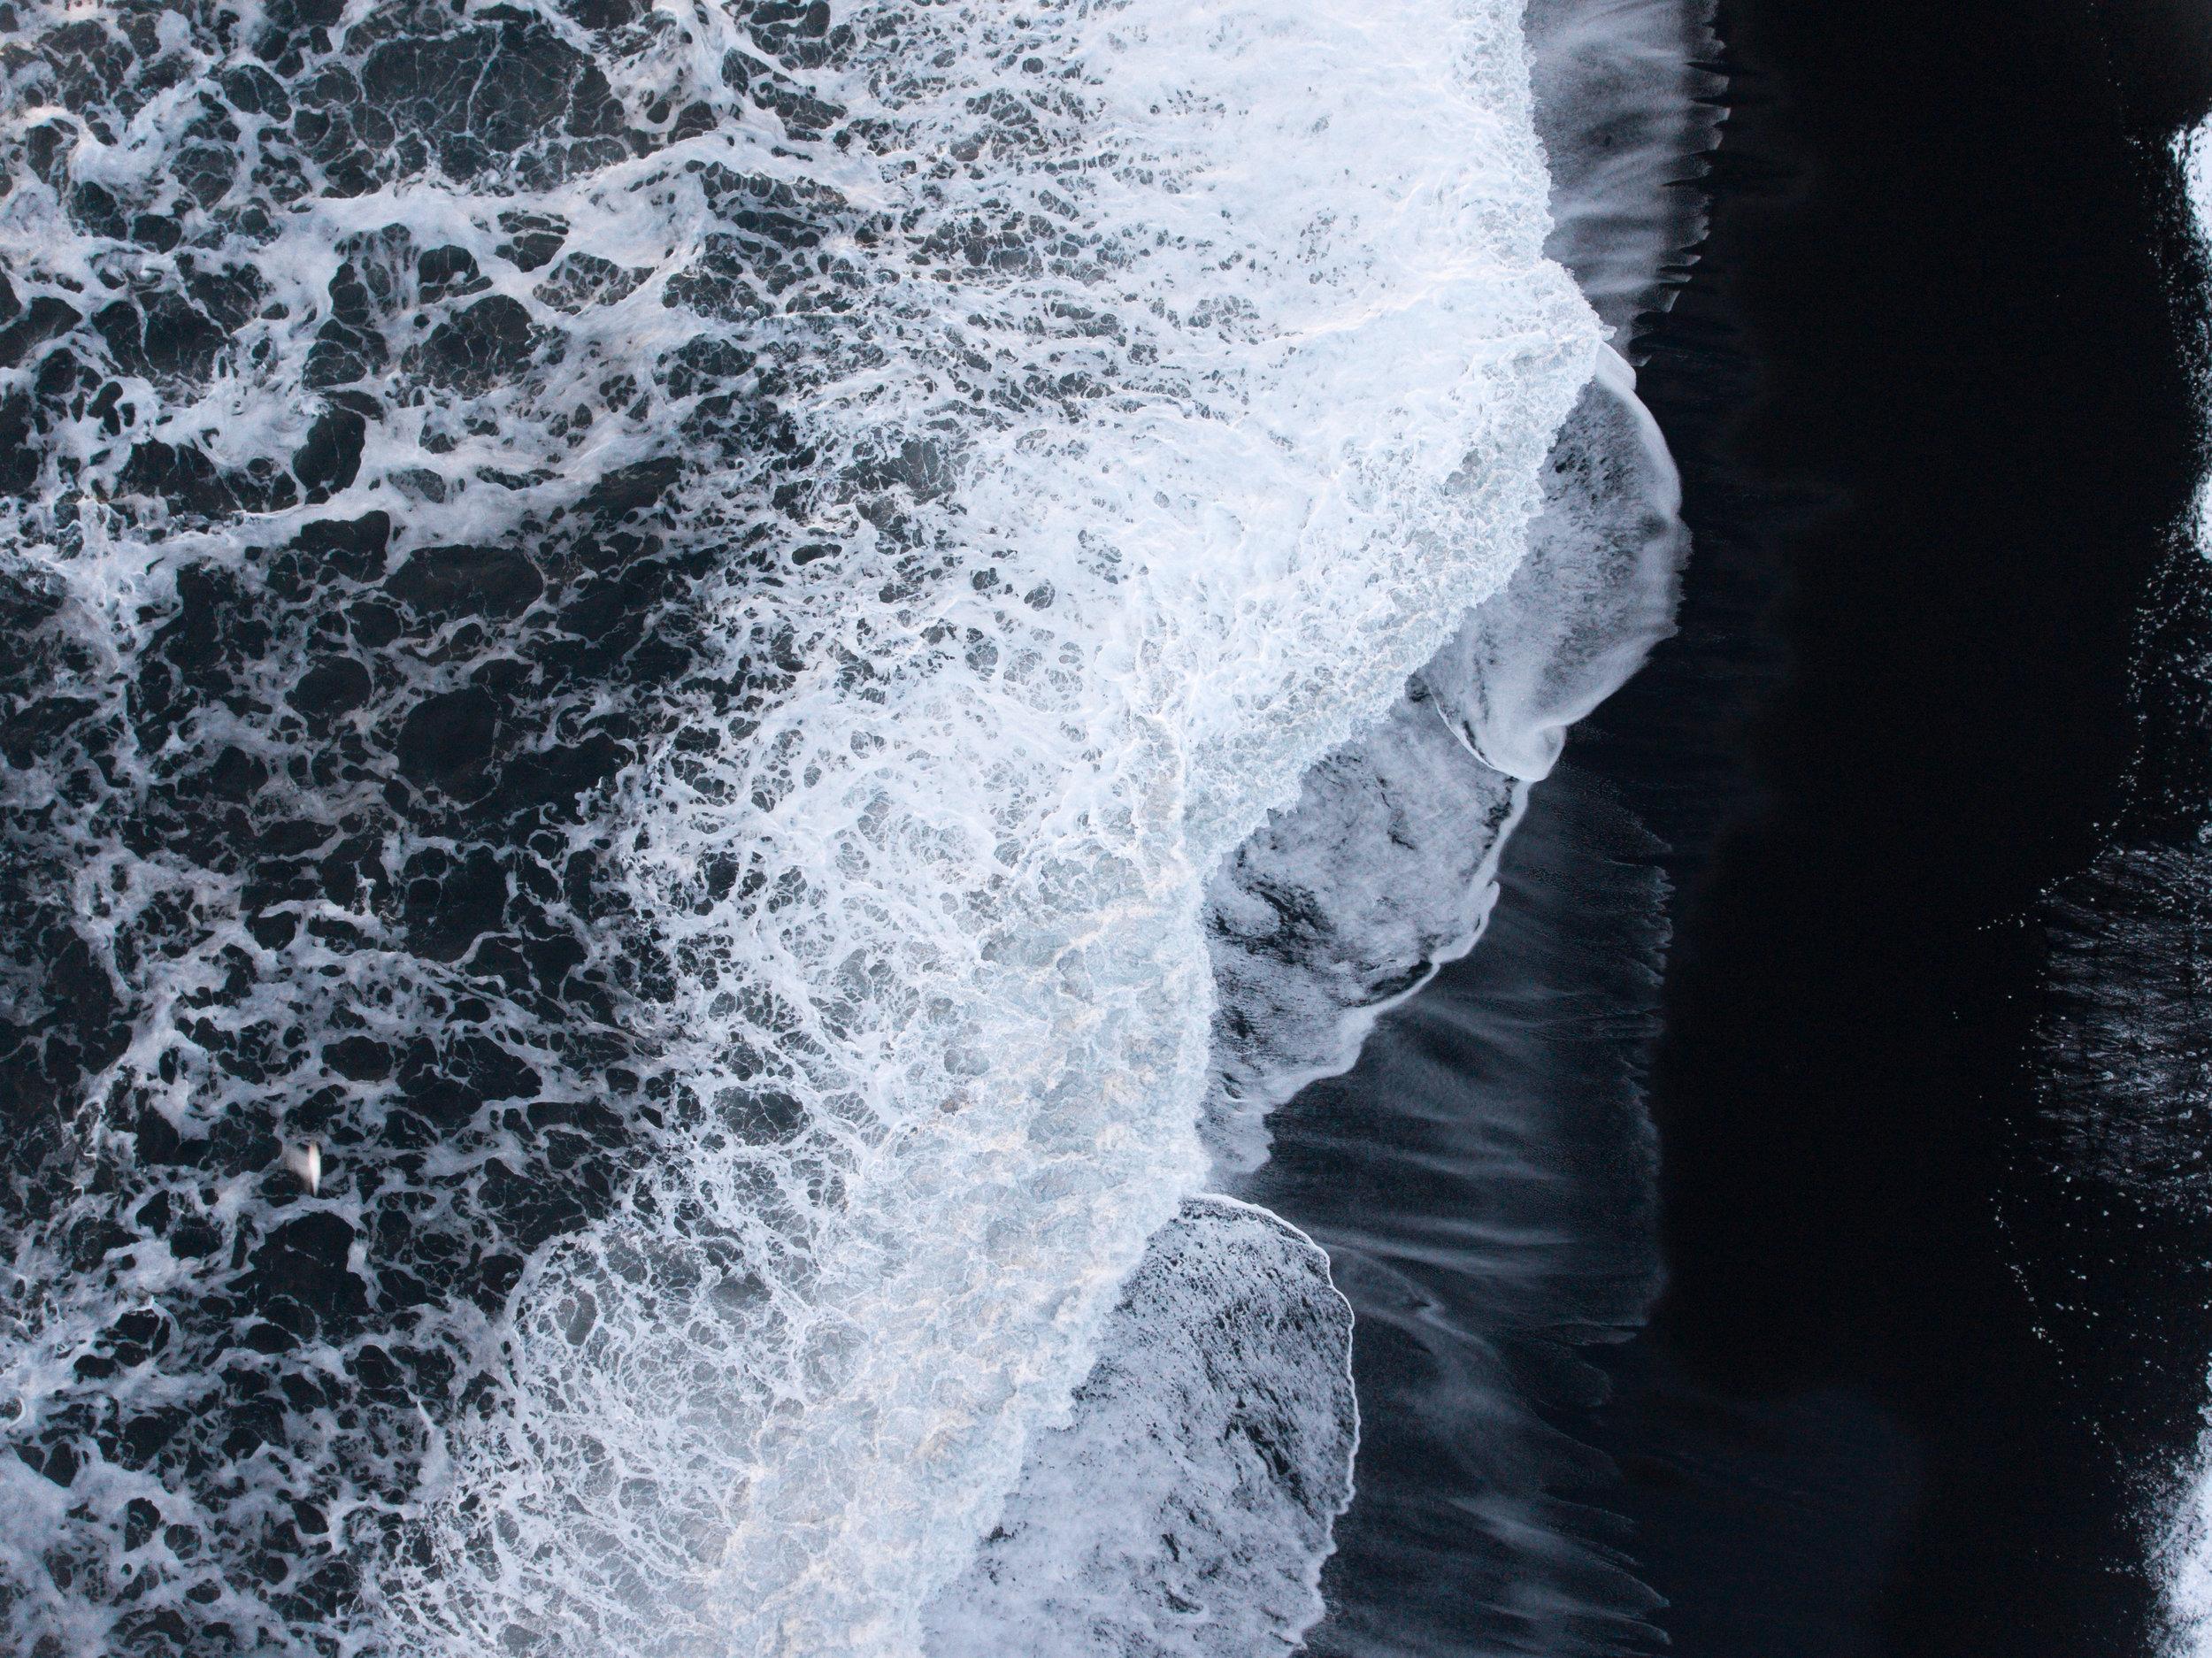 jermiah-schuster-iceland-396.jpg